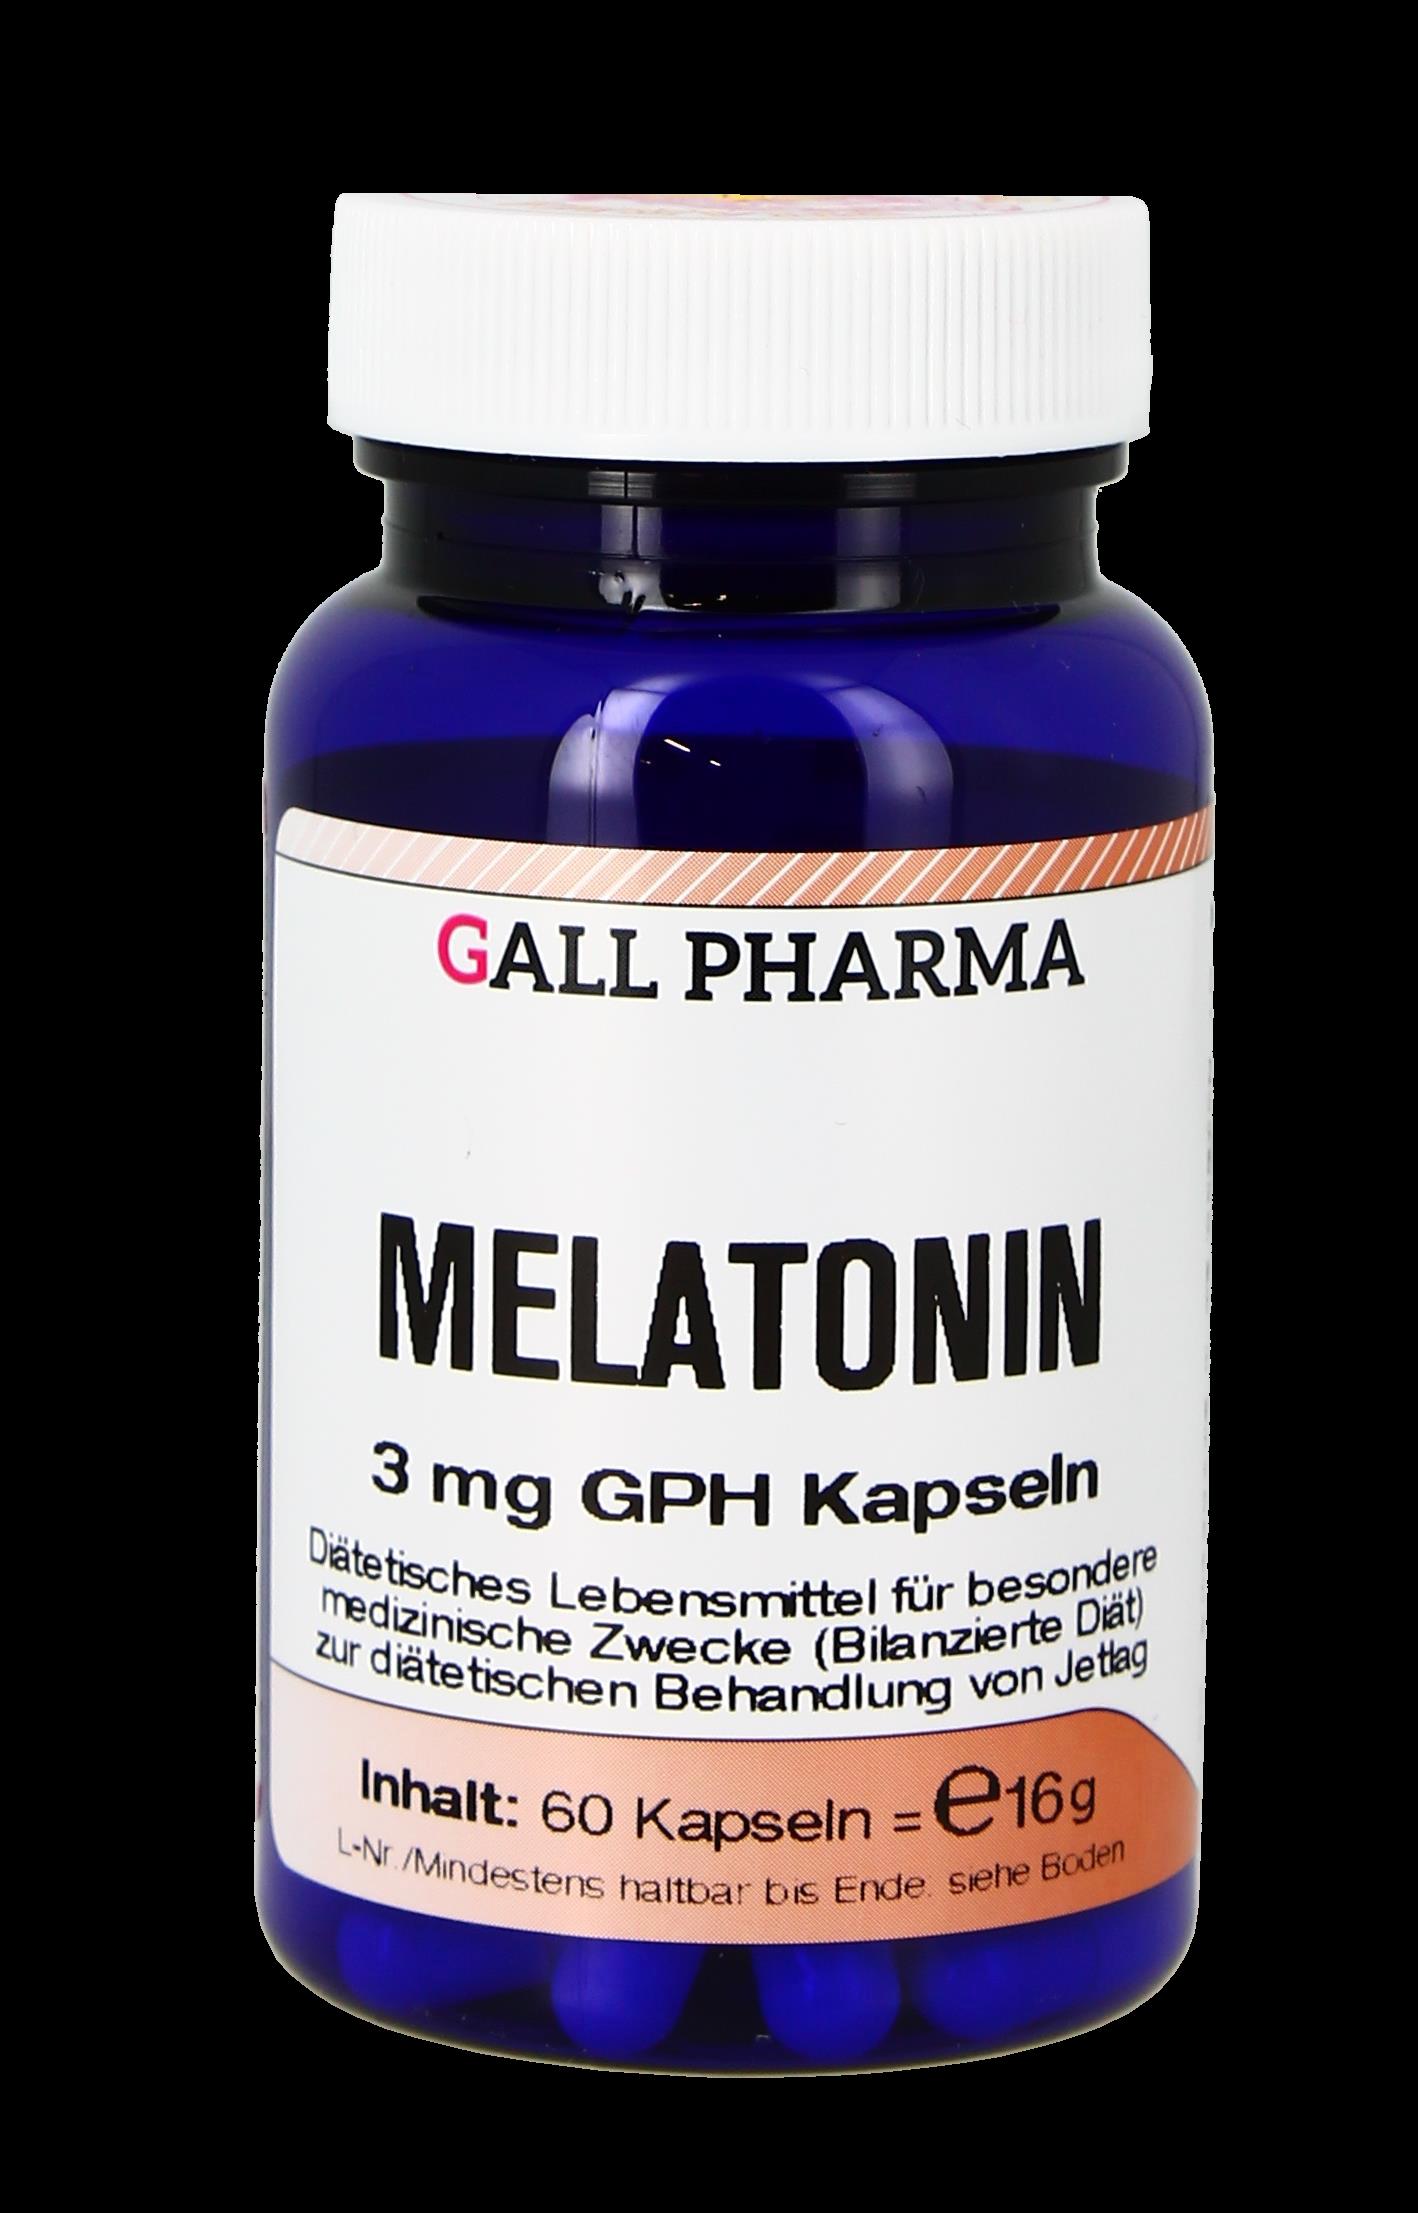 Melatonin 3,0 mg GPH Kapseln